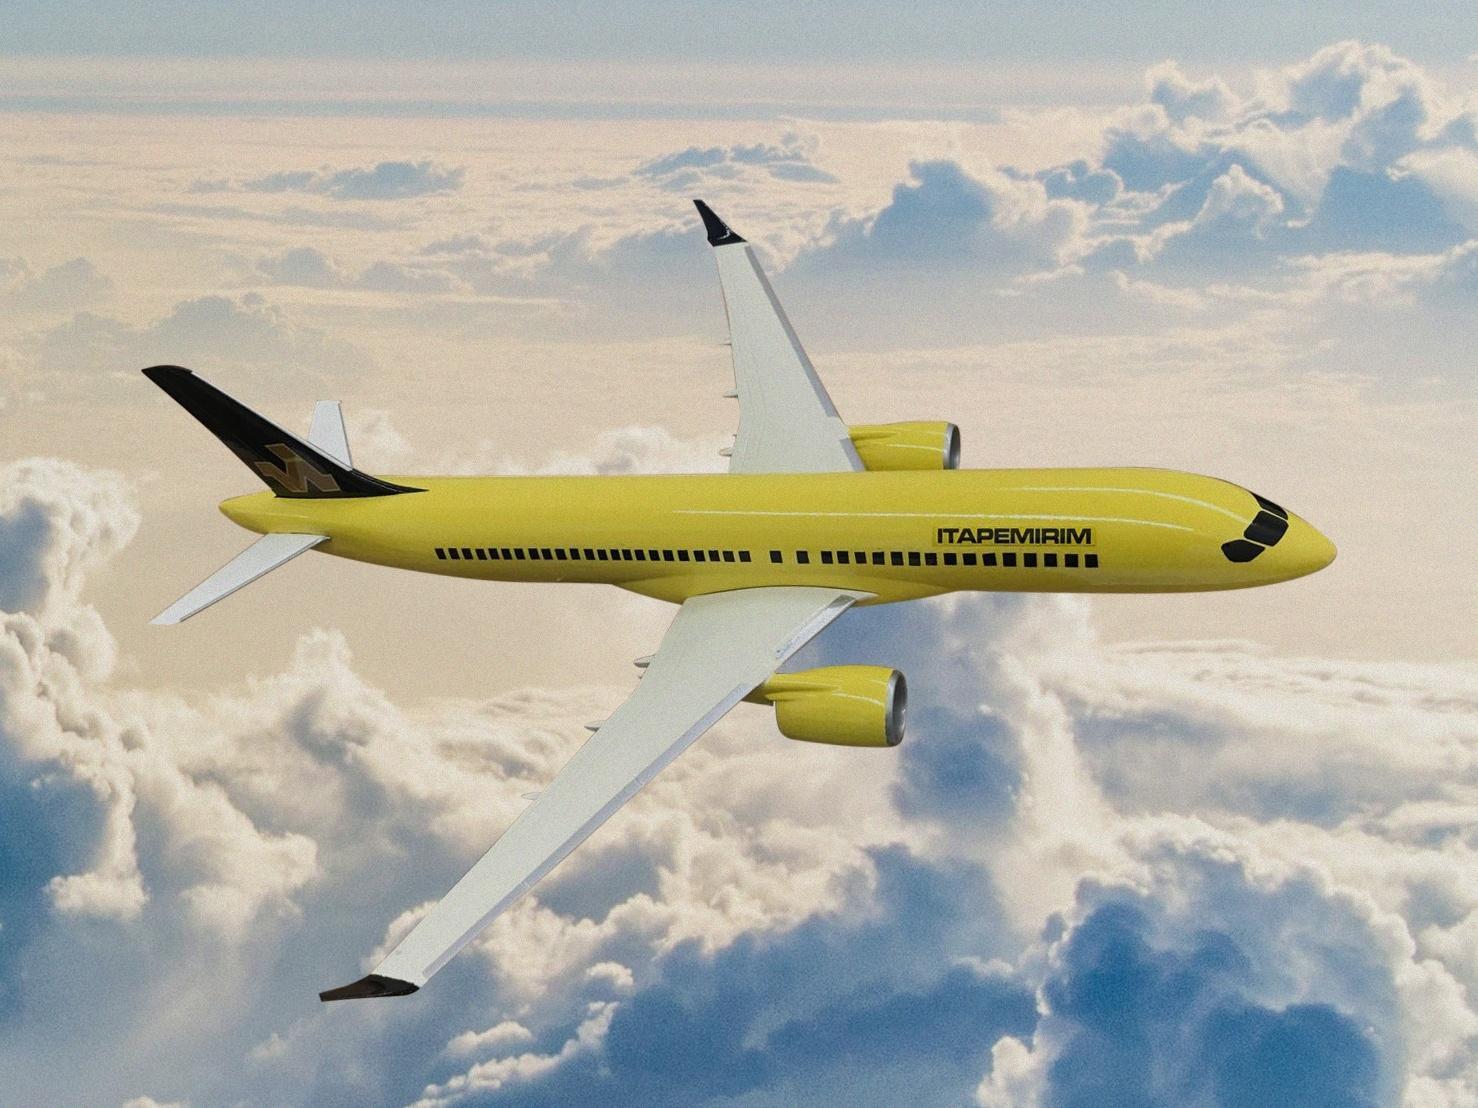 Primeiro voo comercial da Itapemirim tem data marcada